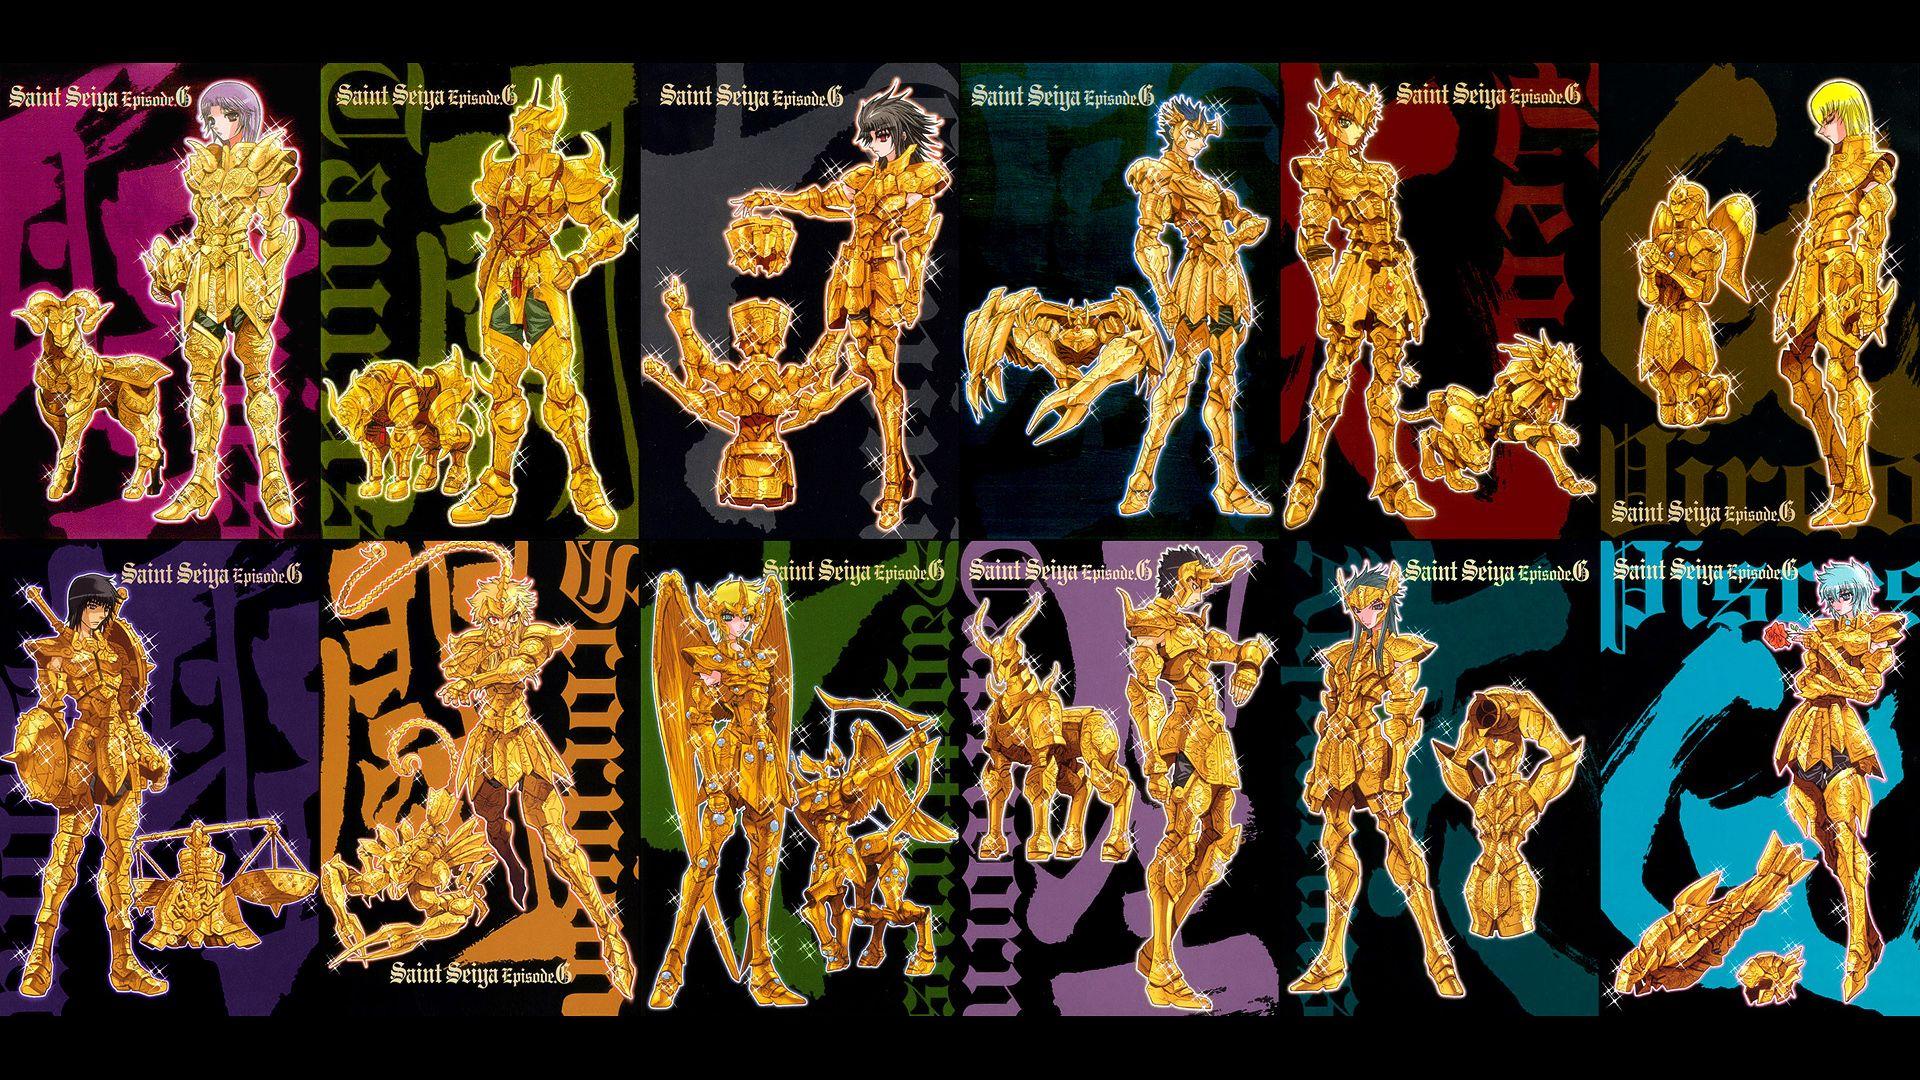 Gold Saints & Armors Episode G Saint Seiya Pinterest